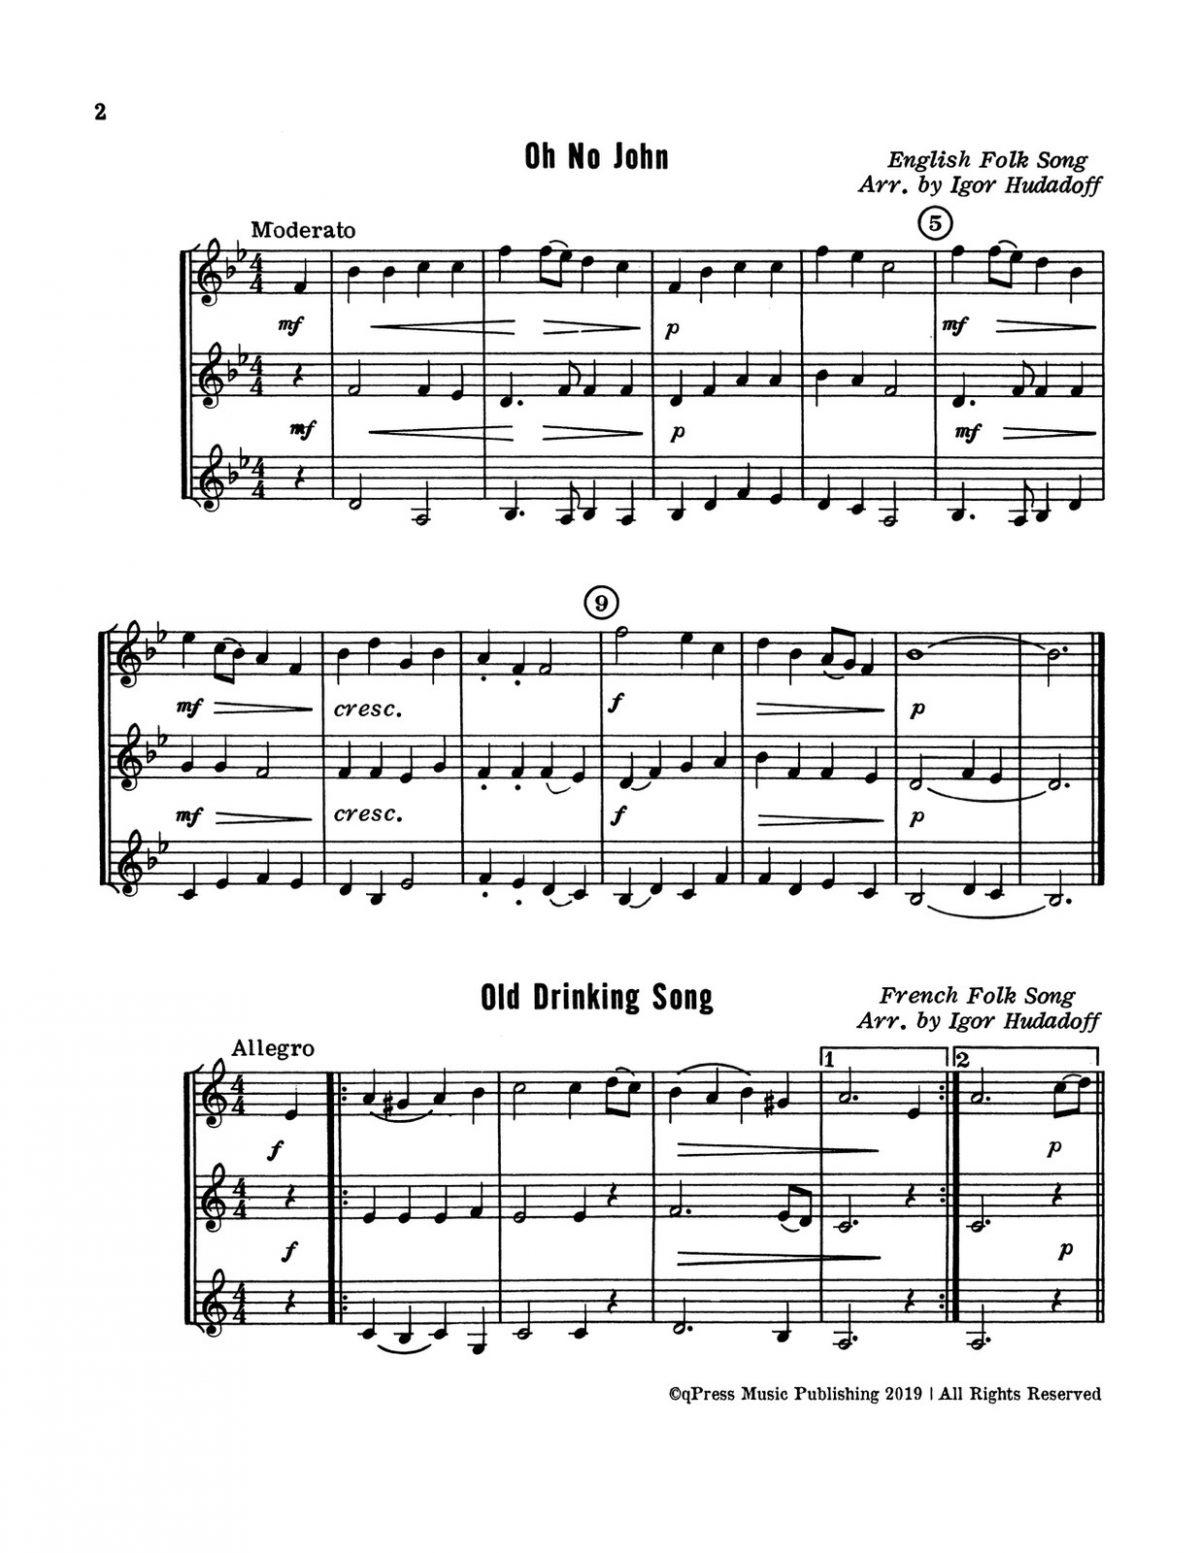 Hudadoff, 24 Trumpet Trios-p04